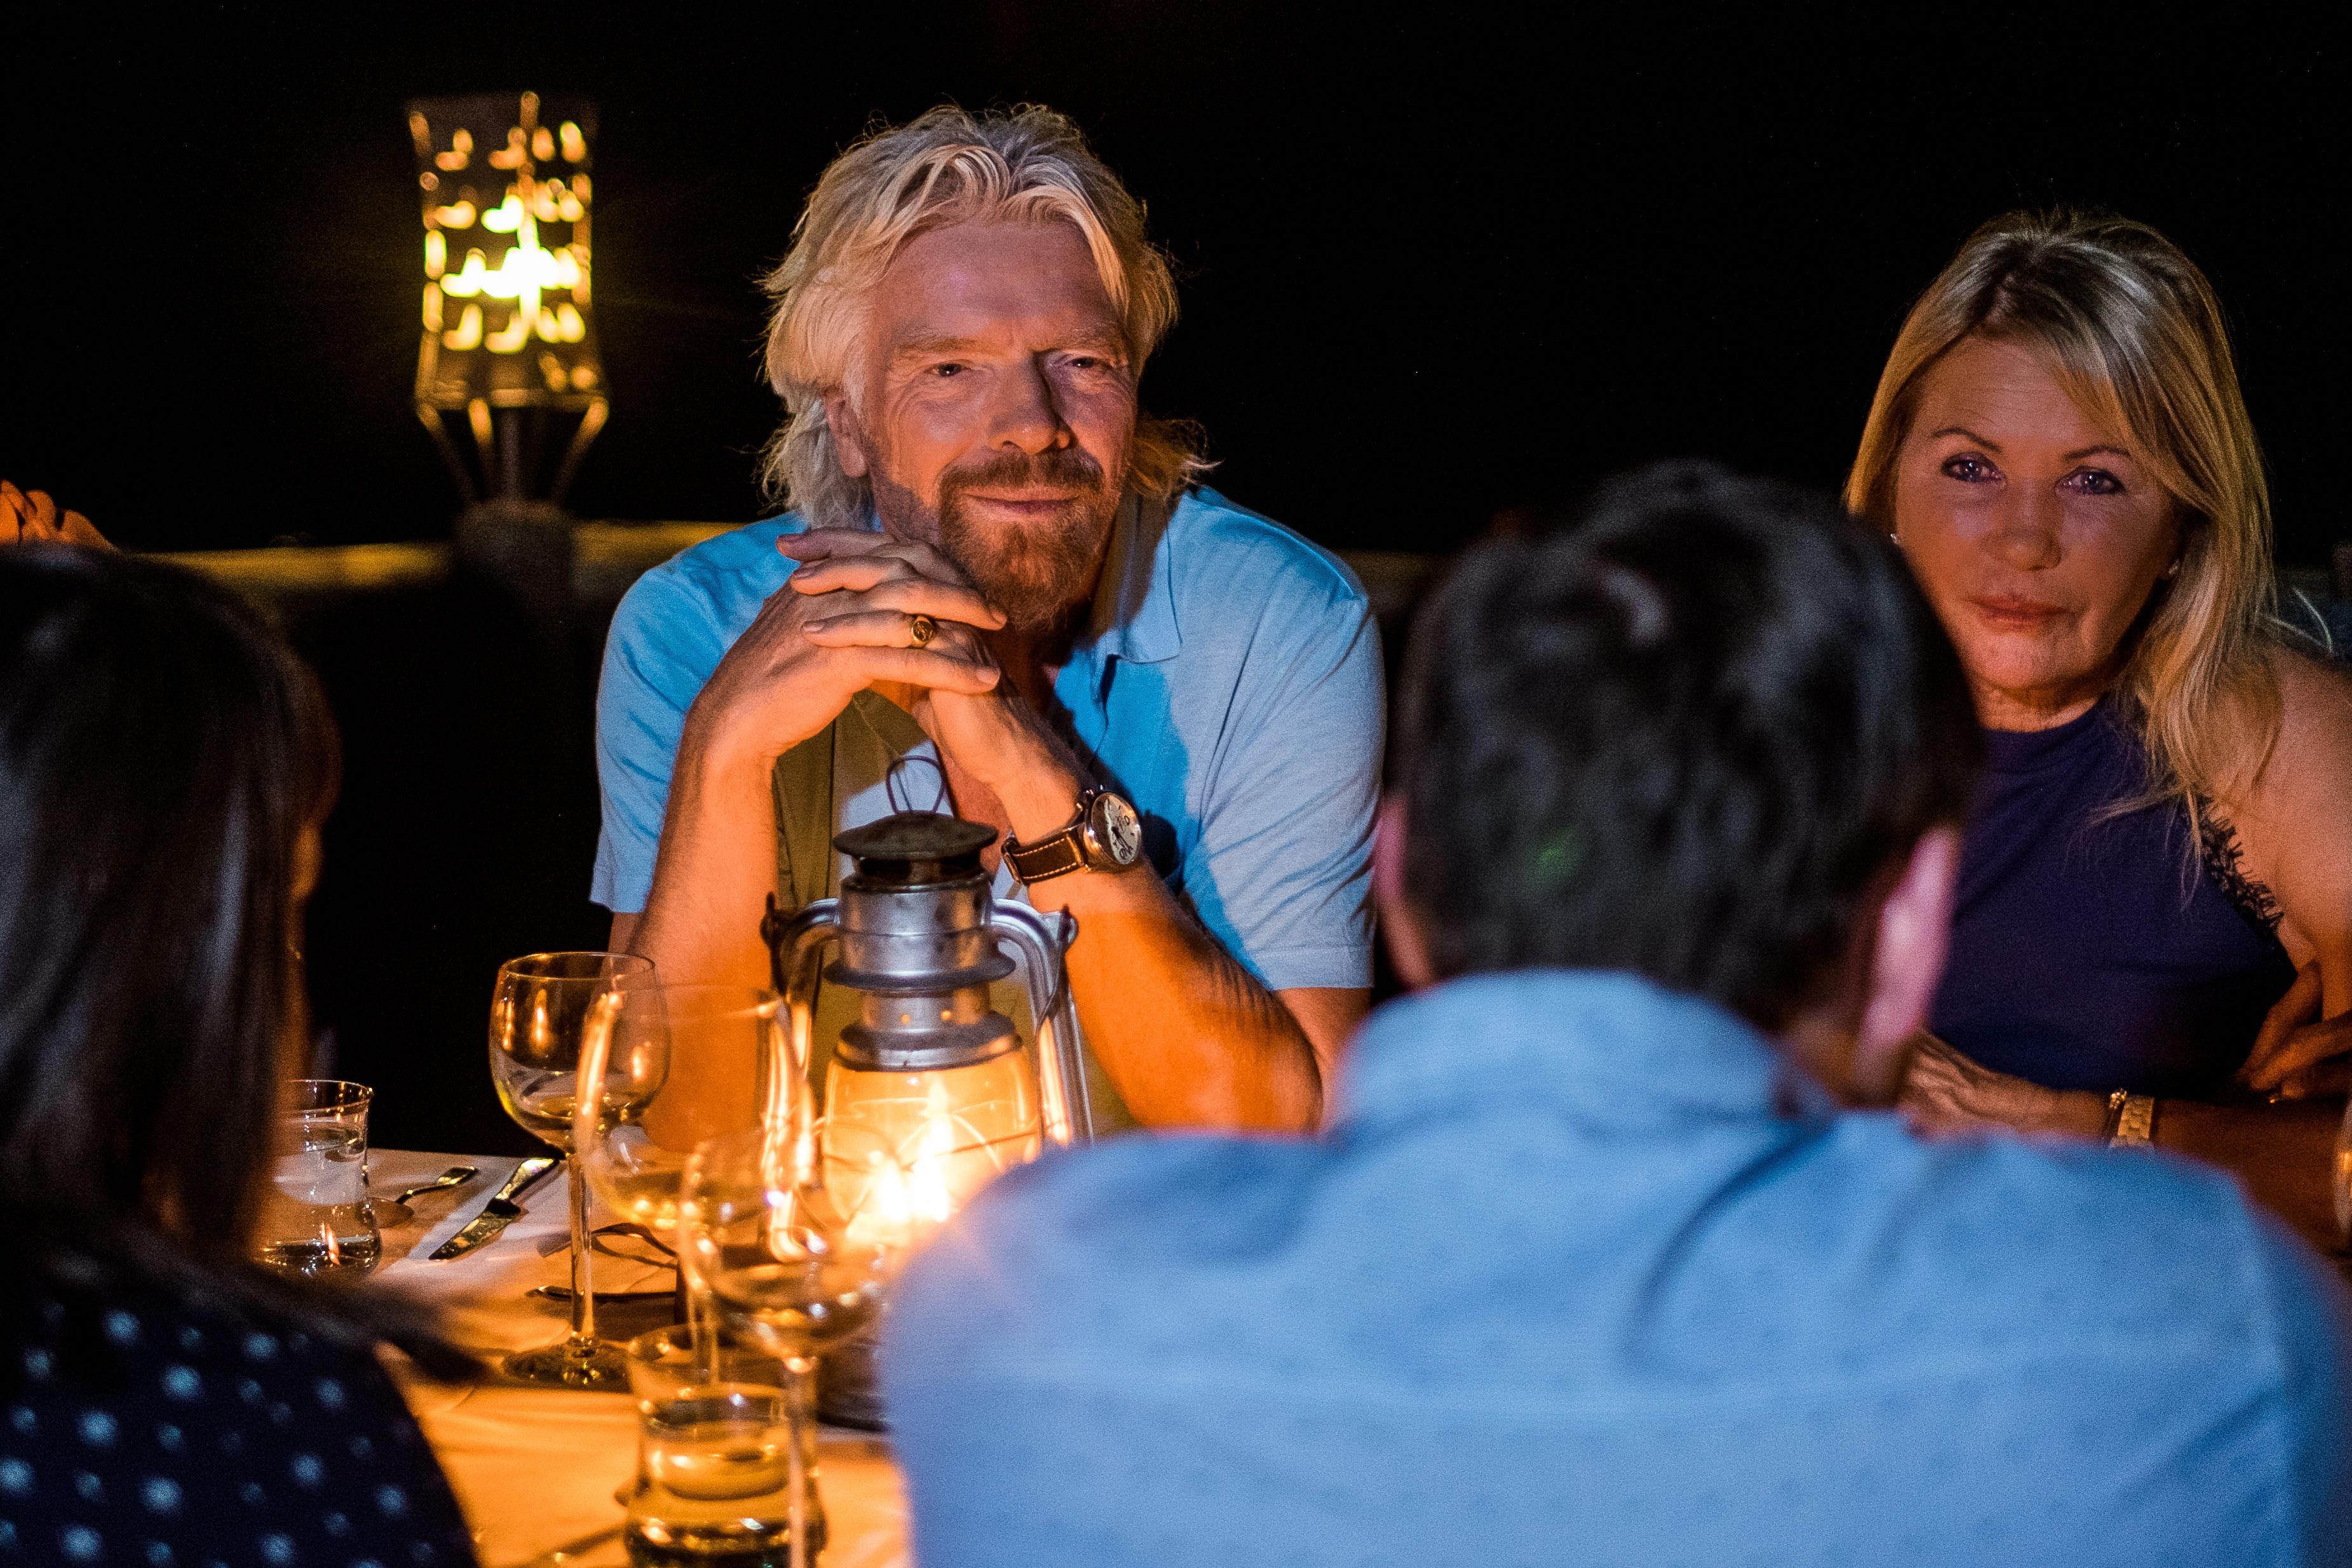 Richard Branson dinner at Ulusaba